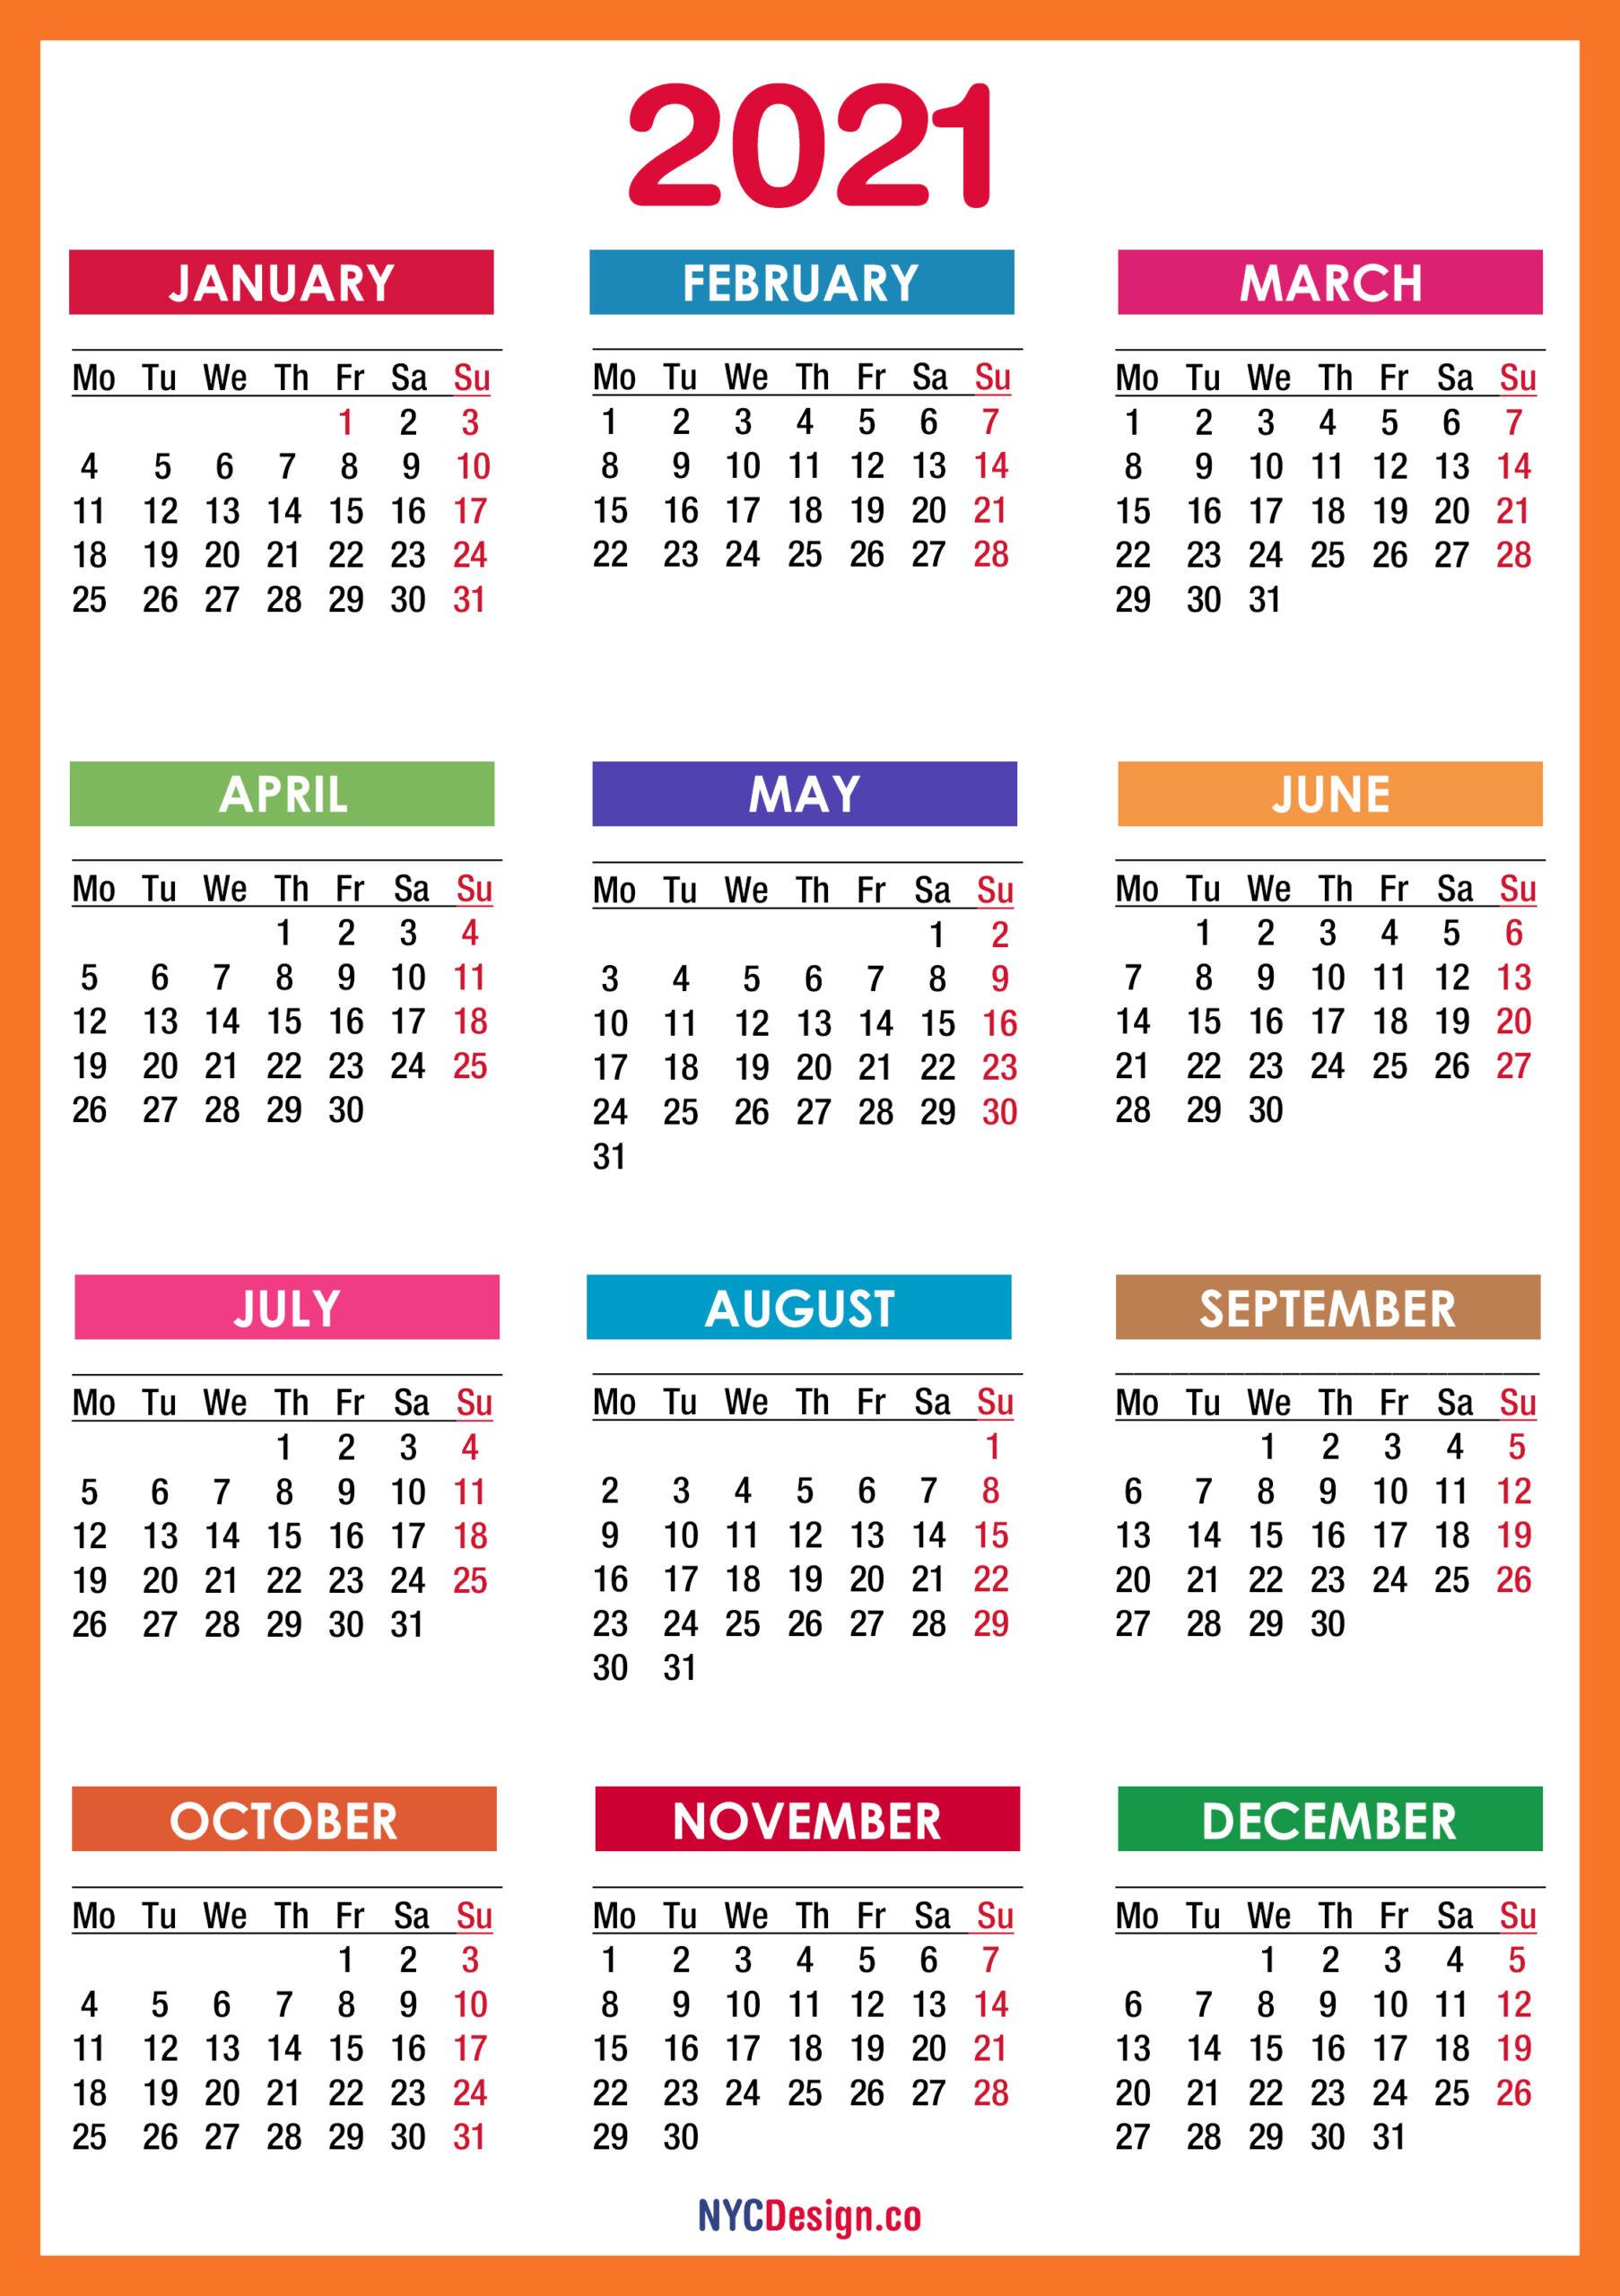 2021 Calendar Printable Free, Pdf, Colorful, Red, Orange pertaining to Desktop Calendars 2021 Free Printable